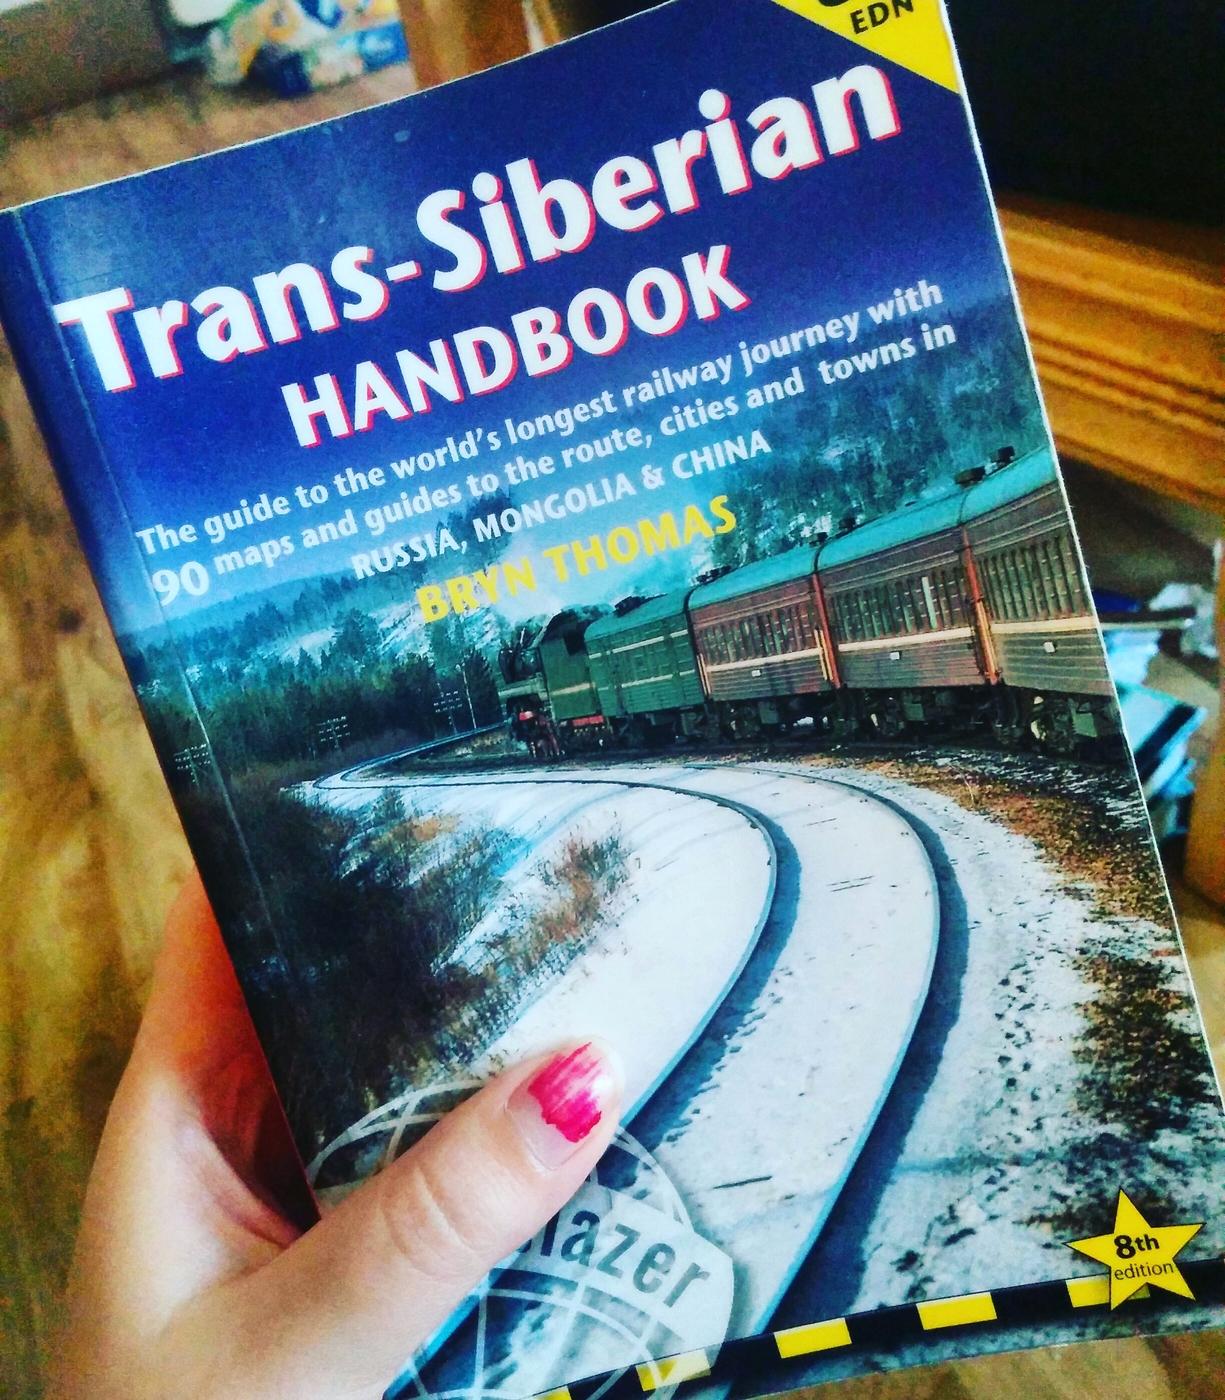 Junalla Venäjän halki: Trans-Mongolia